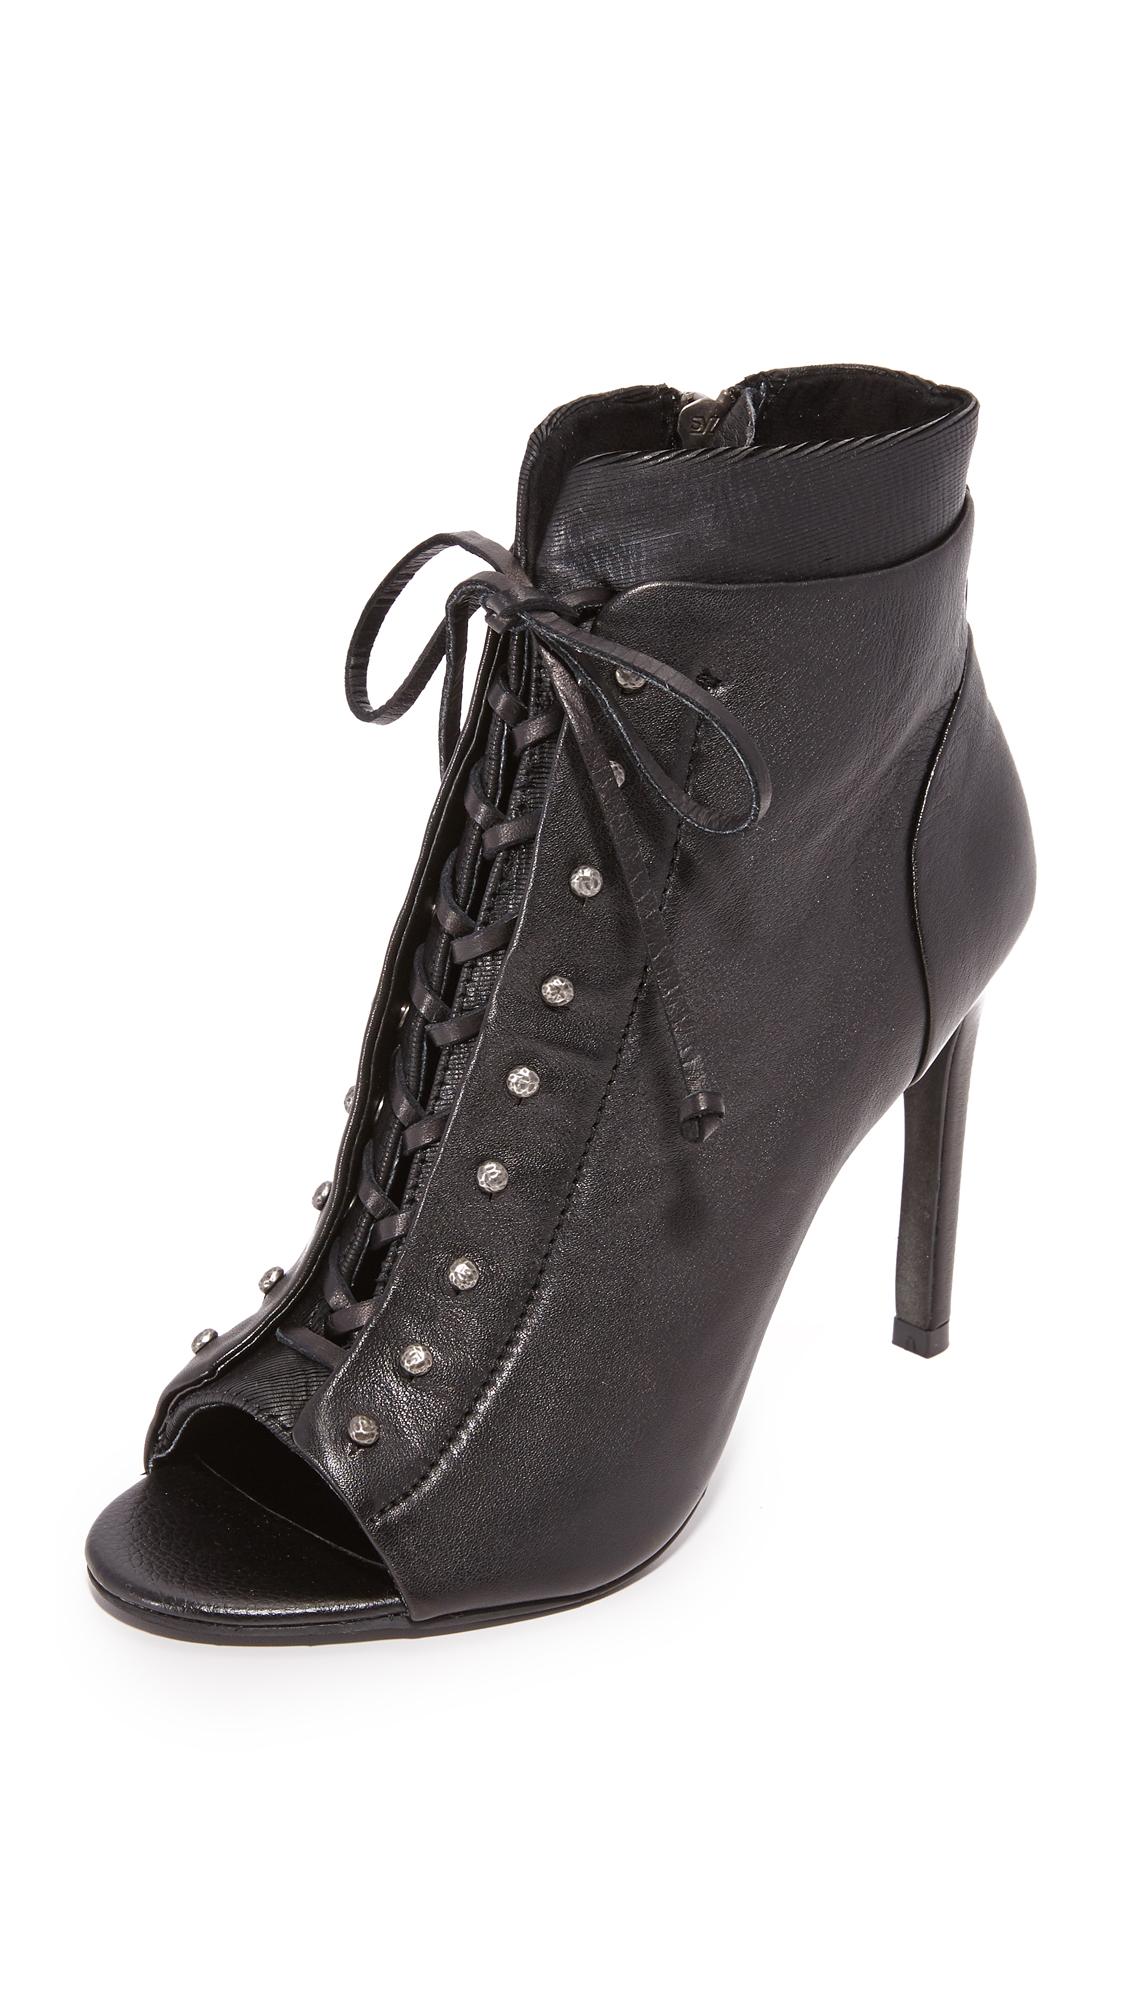 Dolce Vita Hampton Lace Up Heels - Black